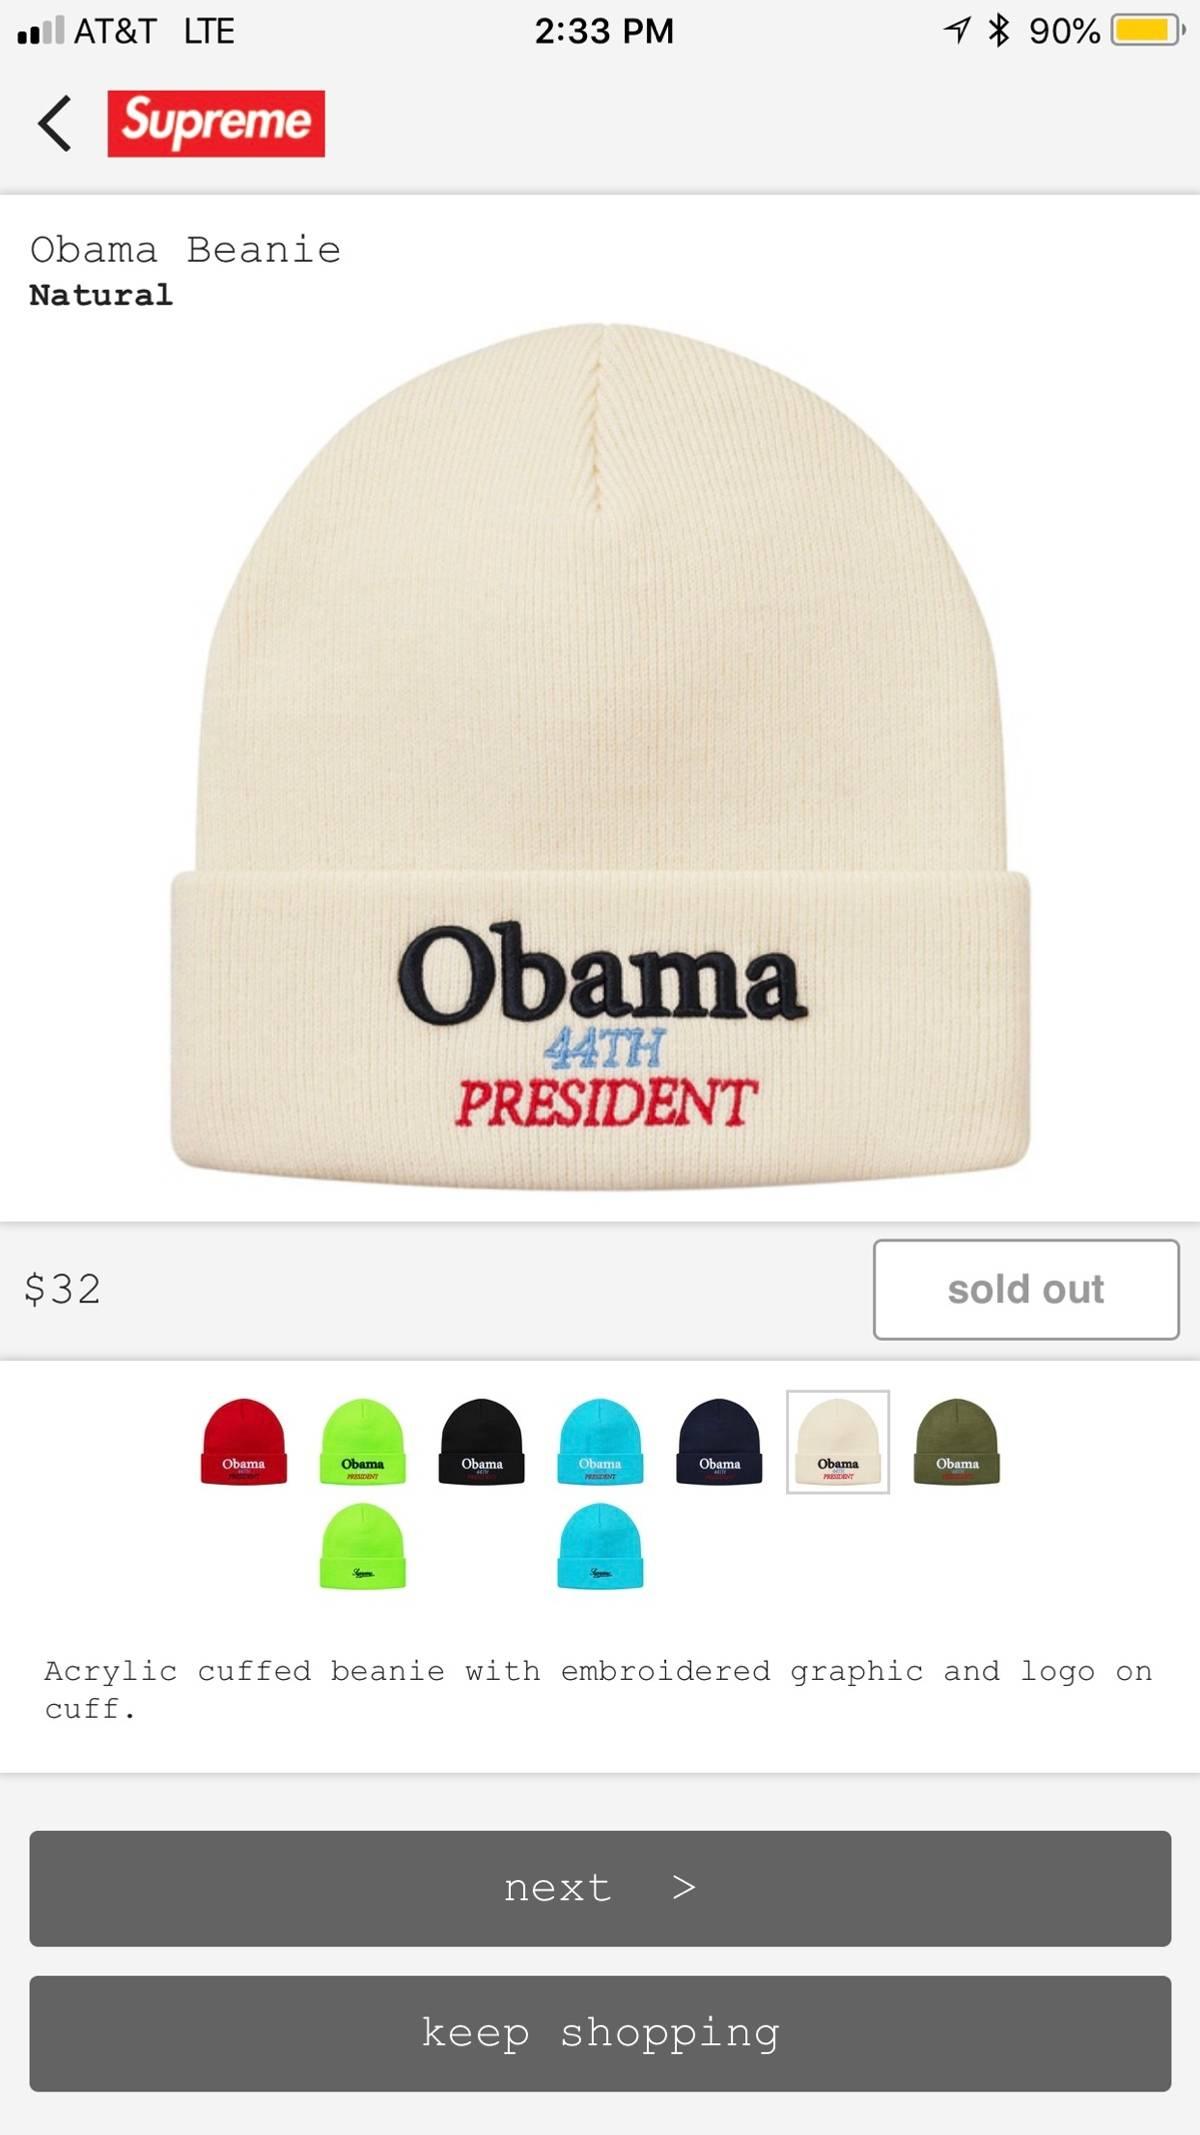 db42dfc3 Supreme ×. Supreme Obama Beanie. Size: ONE SIZE